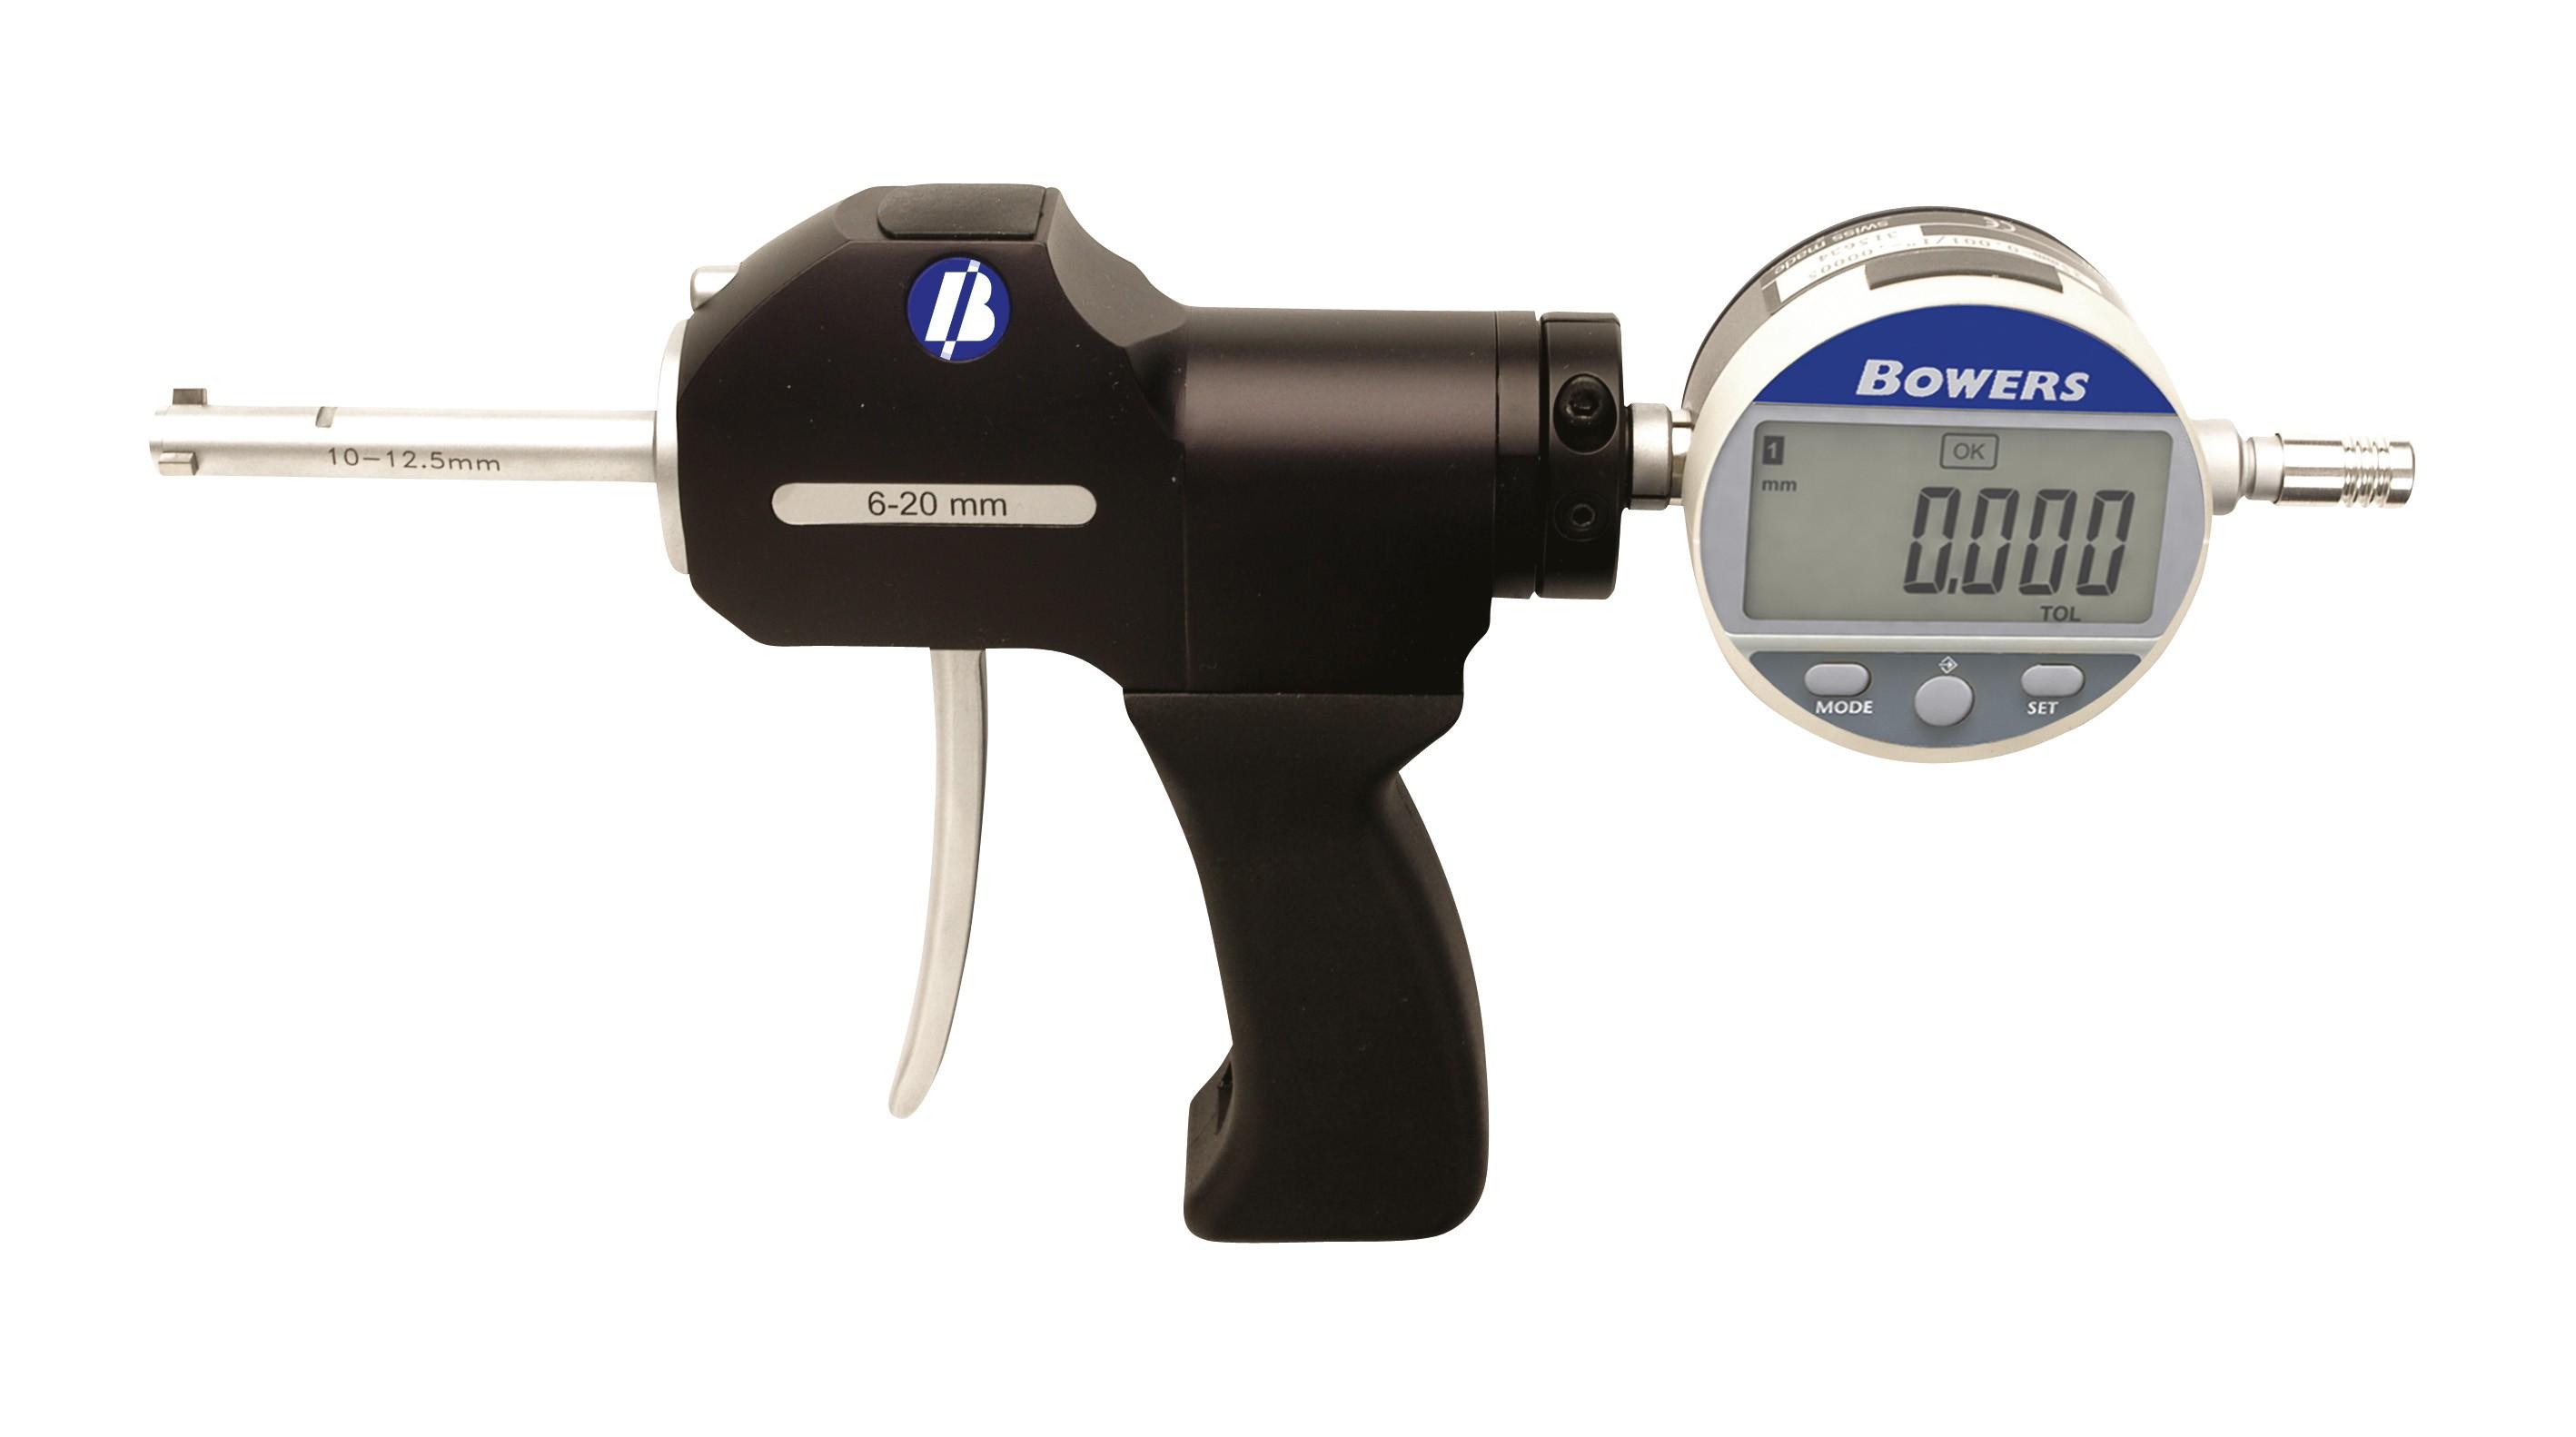 Thiết bị đo lỗ SXTHSY3M Bowers